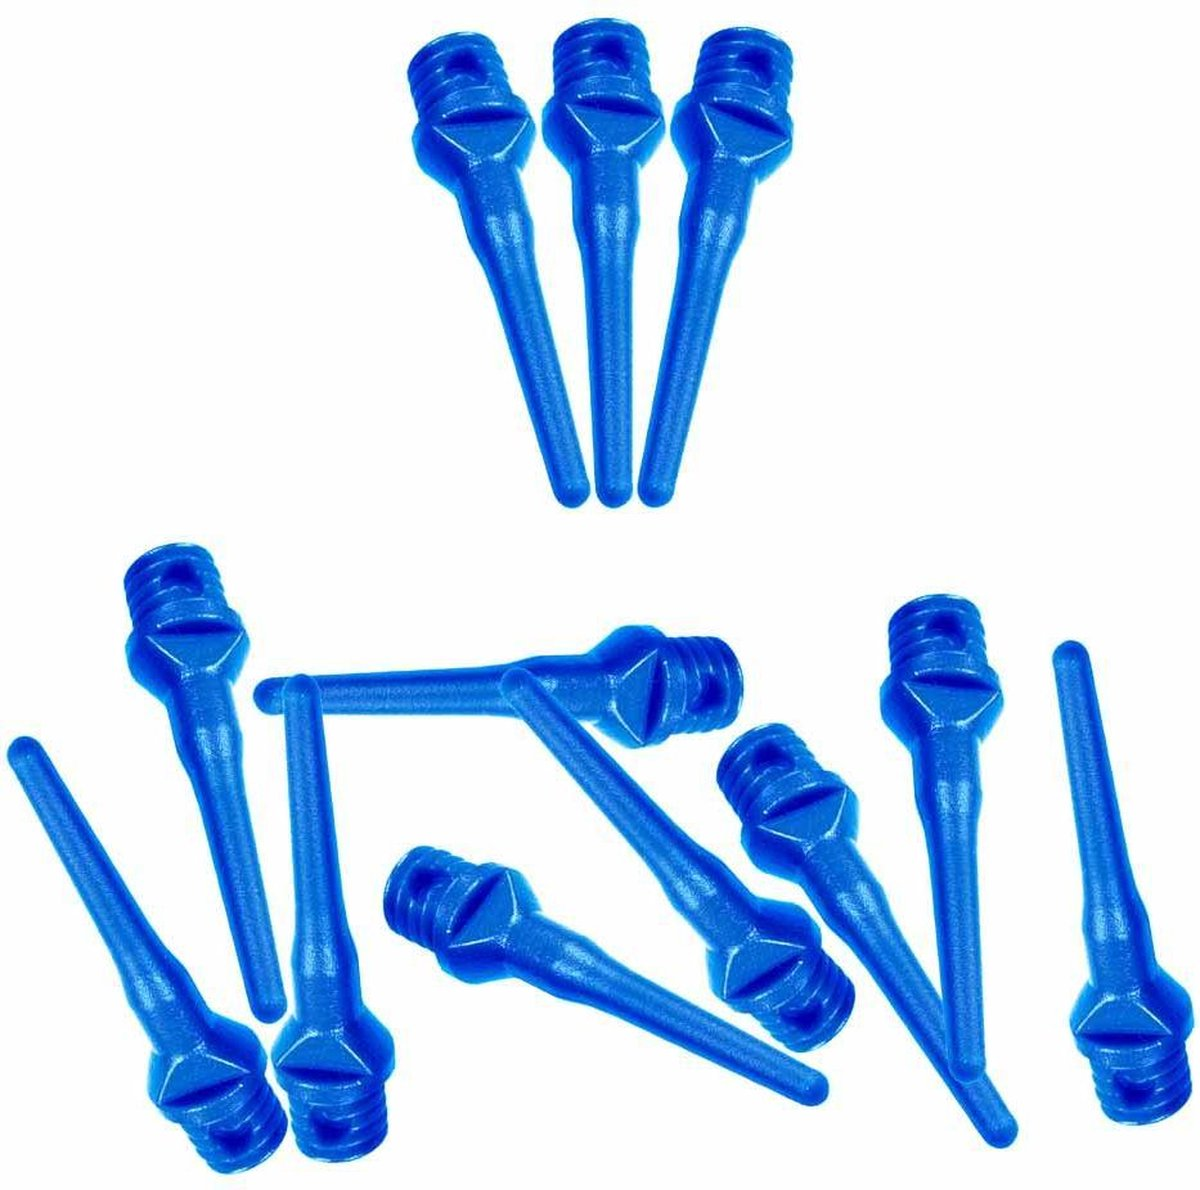 ABC Darts - Softtip Dartpunten 25 mm - Blauw - ca 1000 stuks